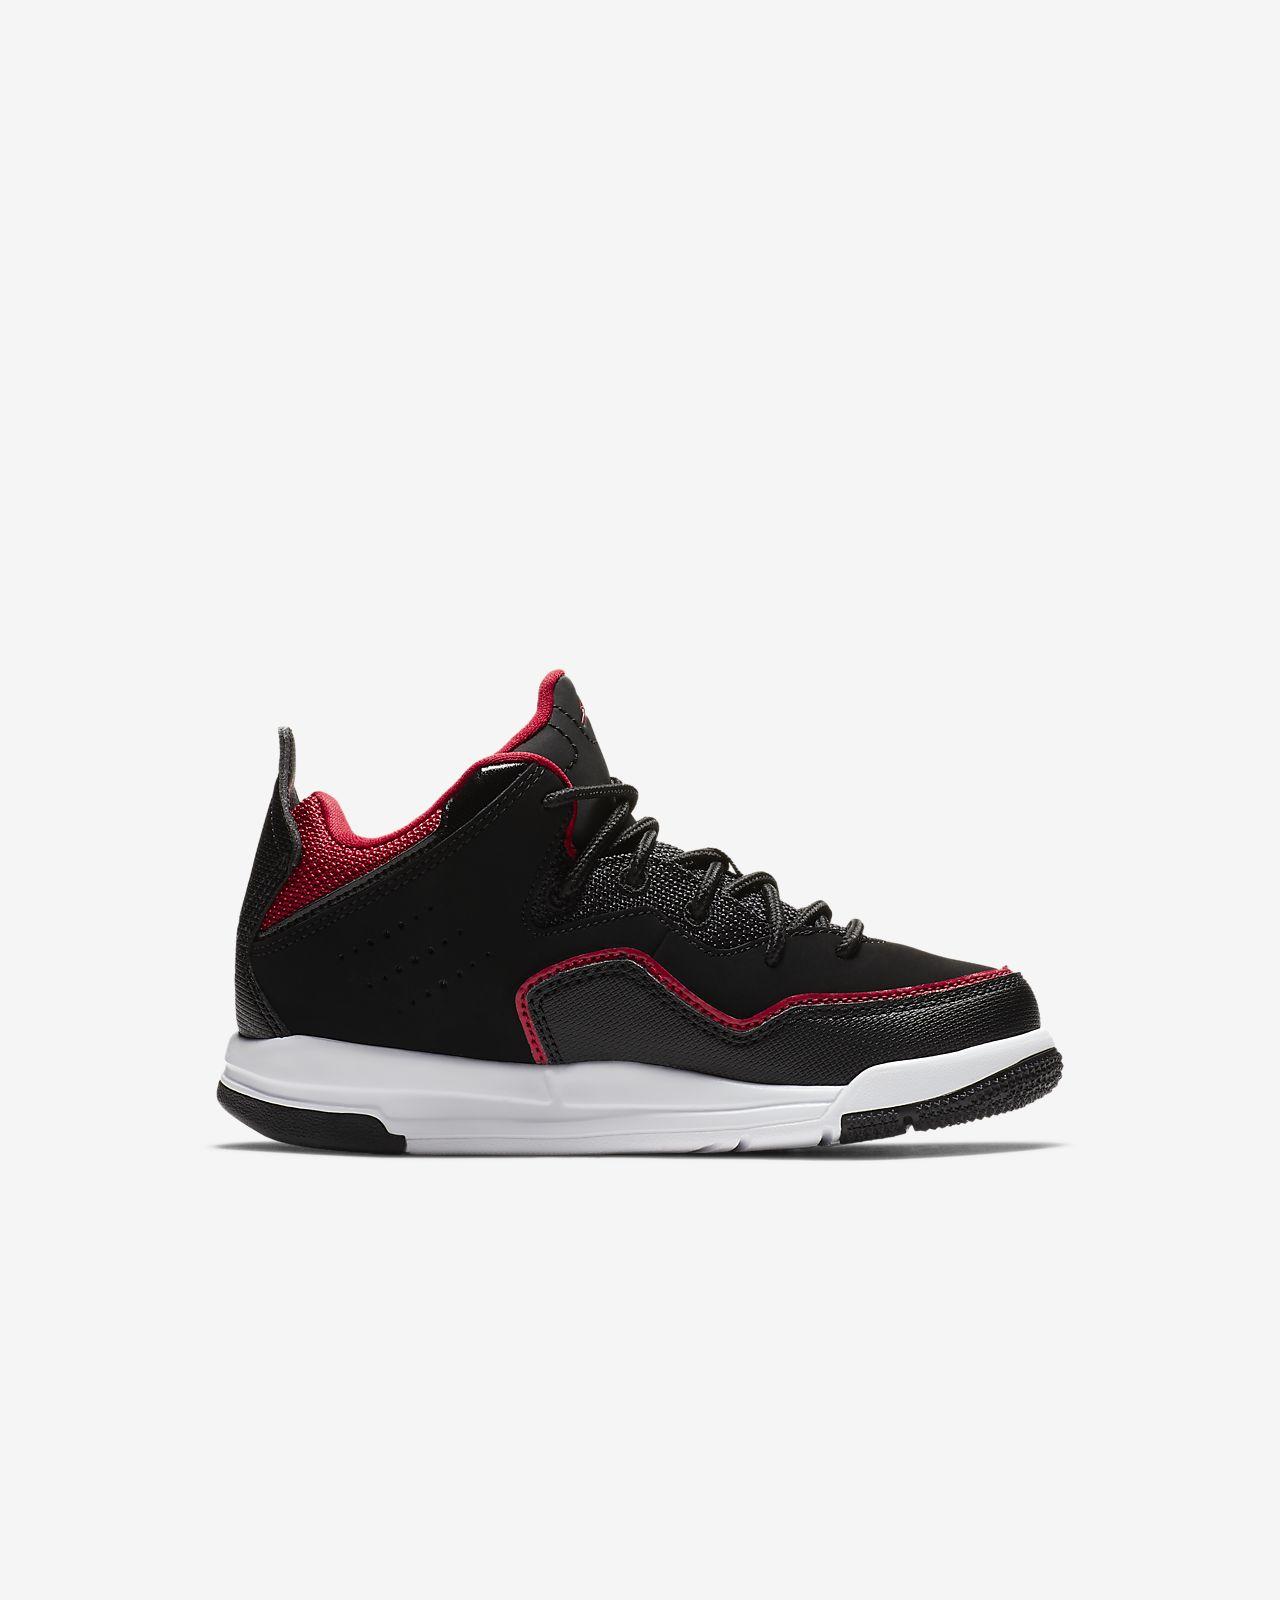 b7a9339b5cd0 Jordan Courtside 23 Younger Kids  Shoe. Nike.com GB